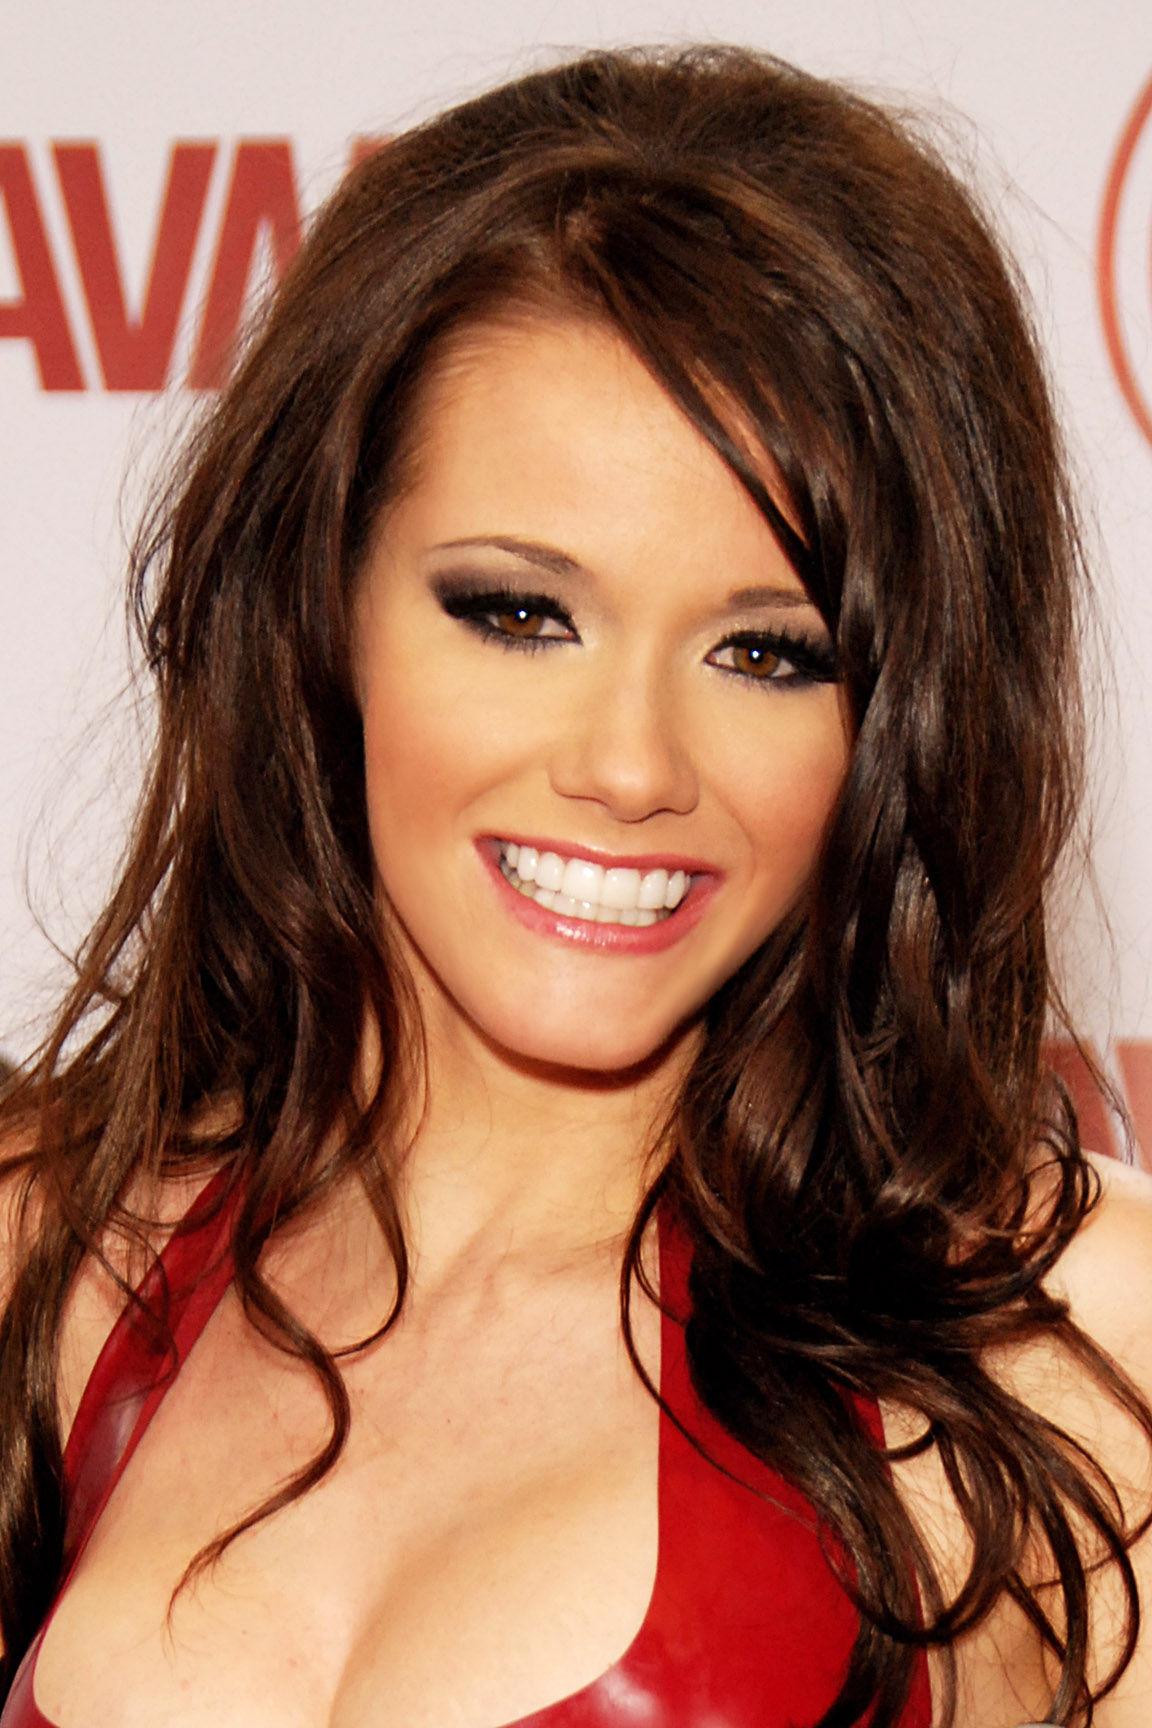 Photo of Raven Alexis: American pornographic actress